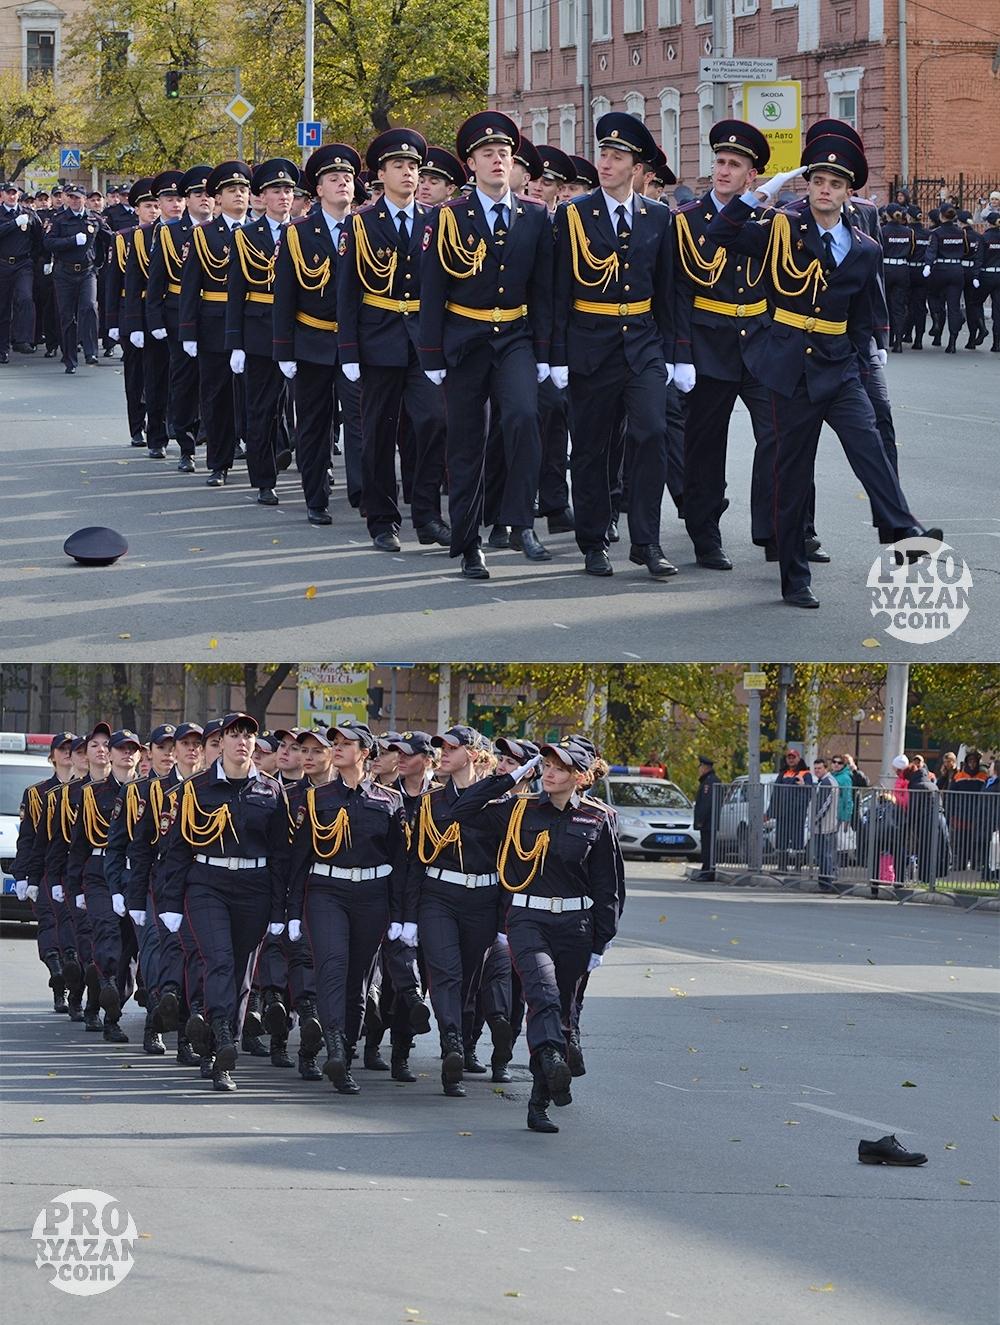 При получении нового знамени рязанские полицейские теряли фуражки и ботинки. Фото Александра Королева.